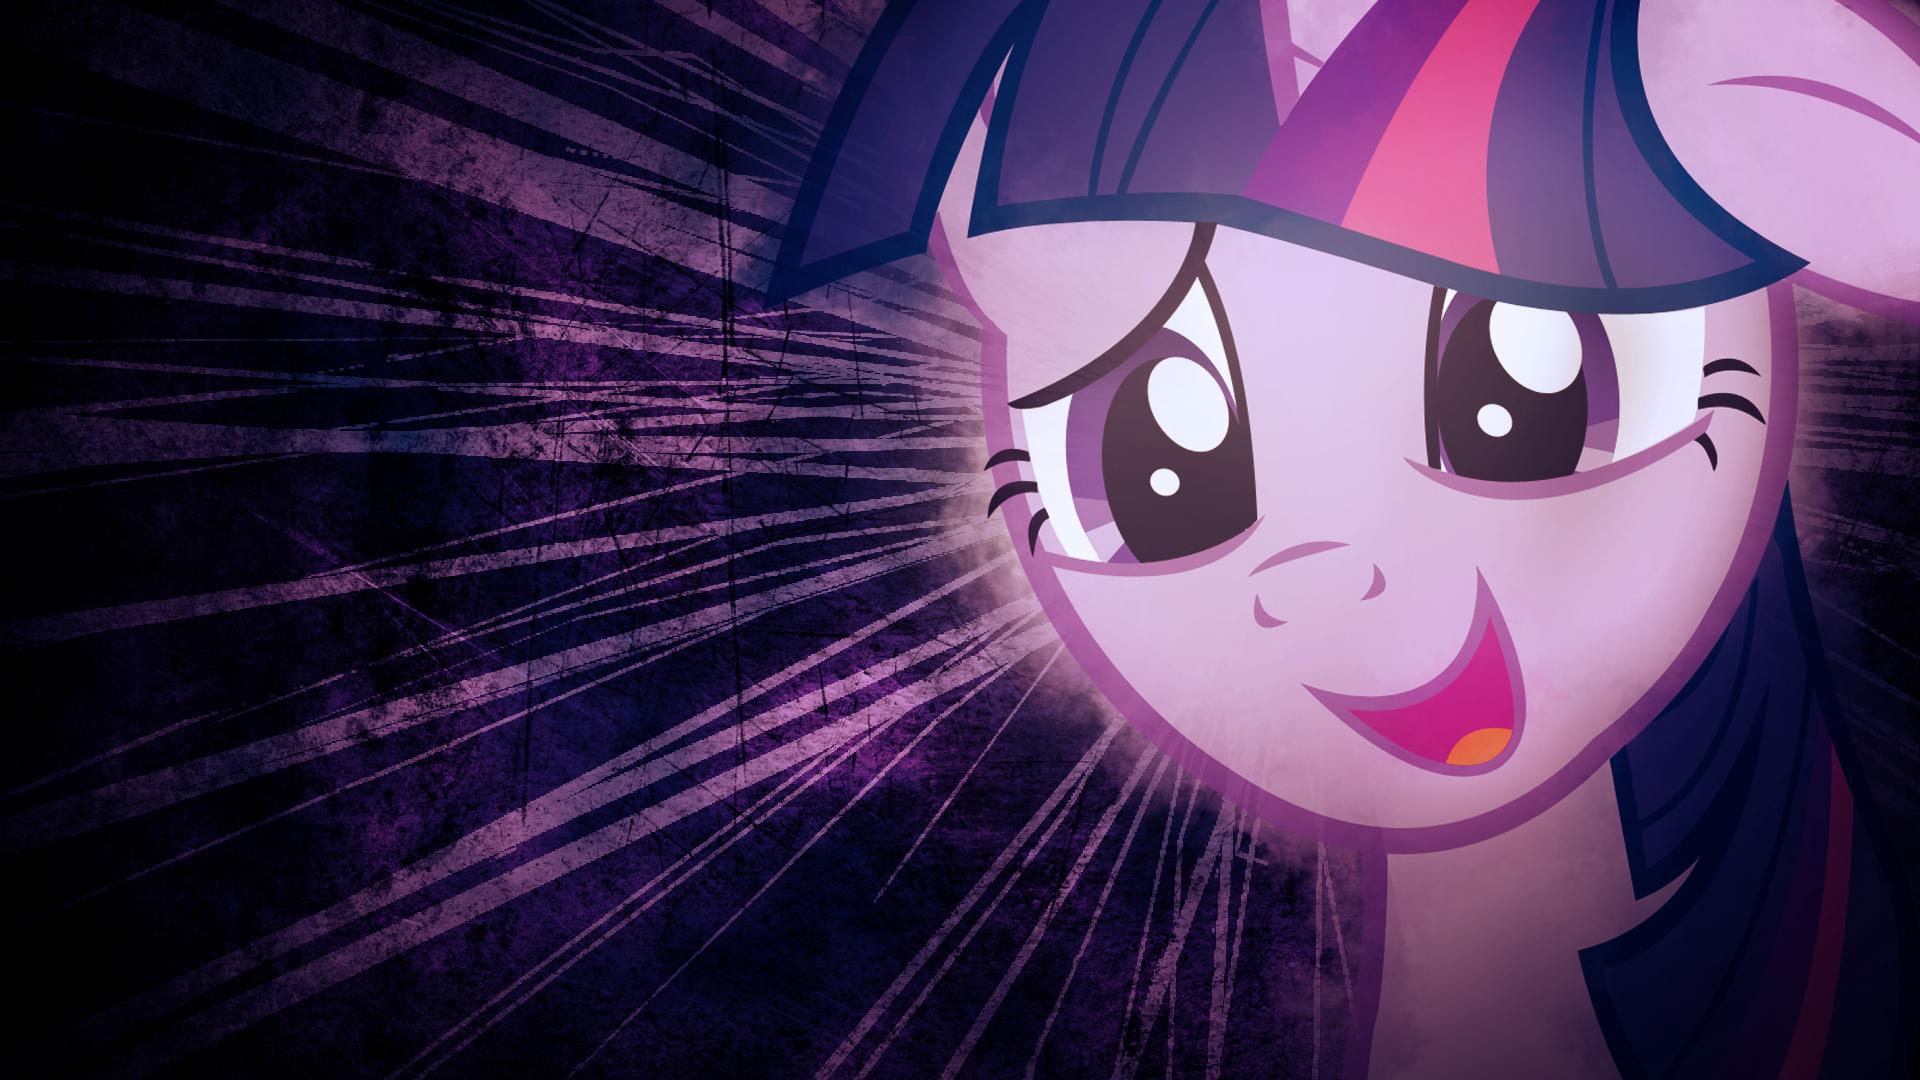 Twilight Sparkle Nerdorable Wallpaper by SandwichDelta